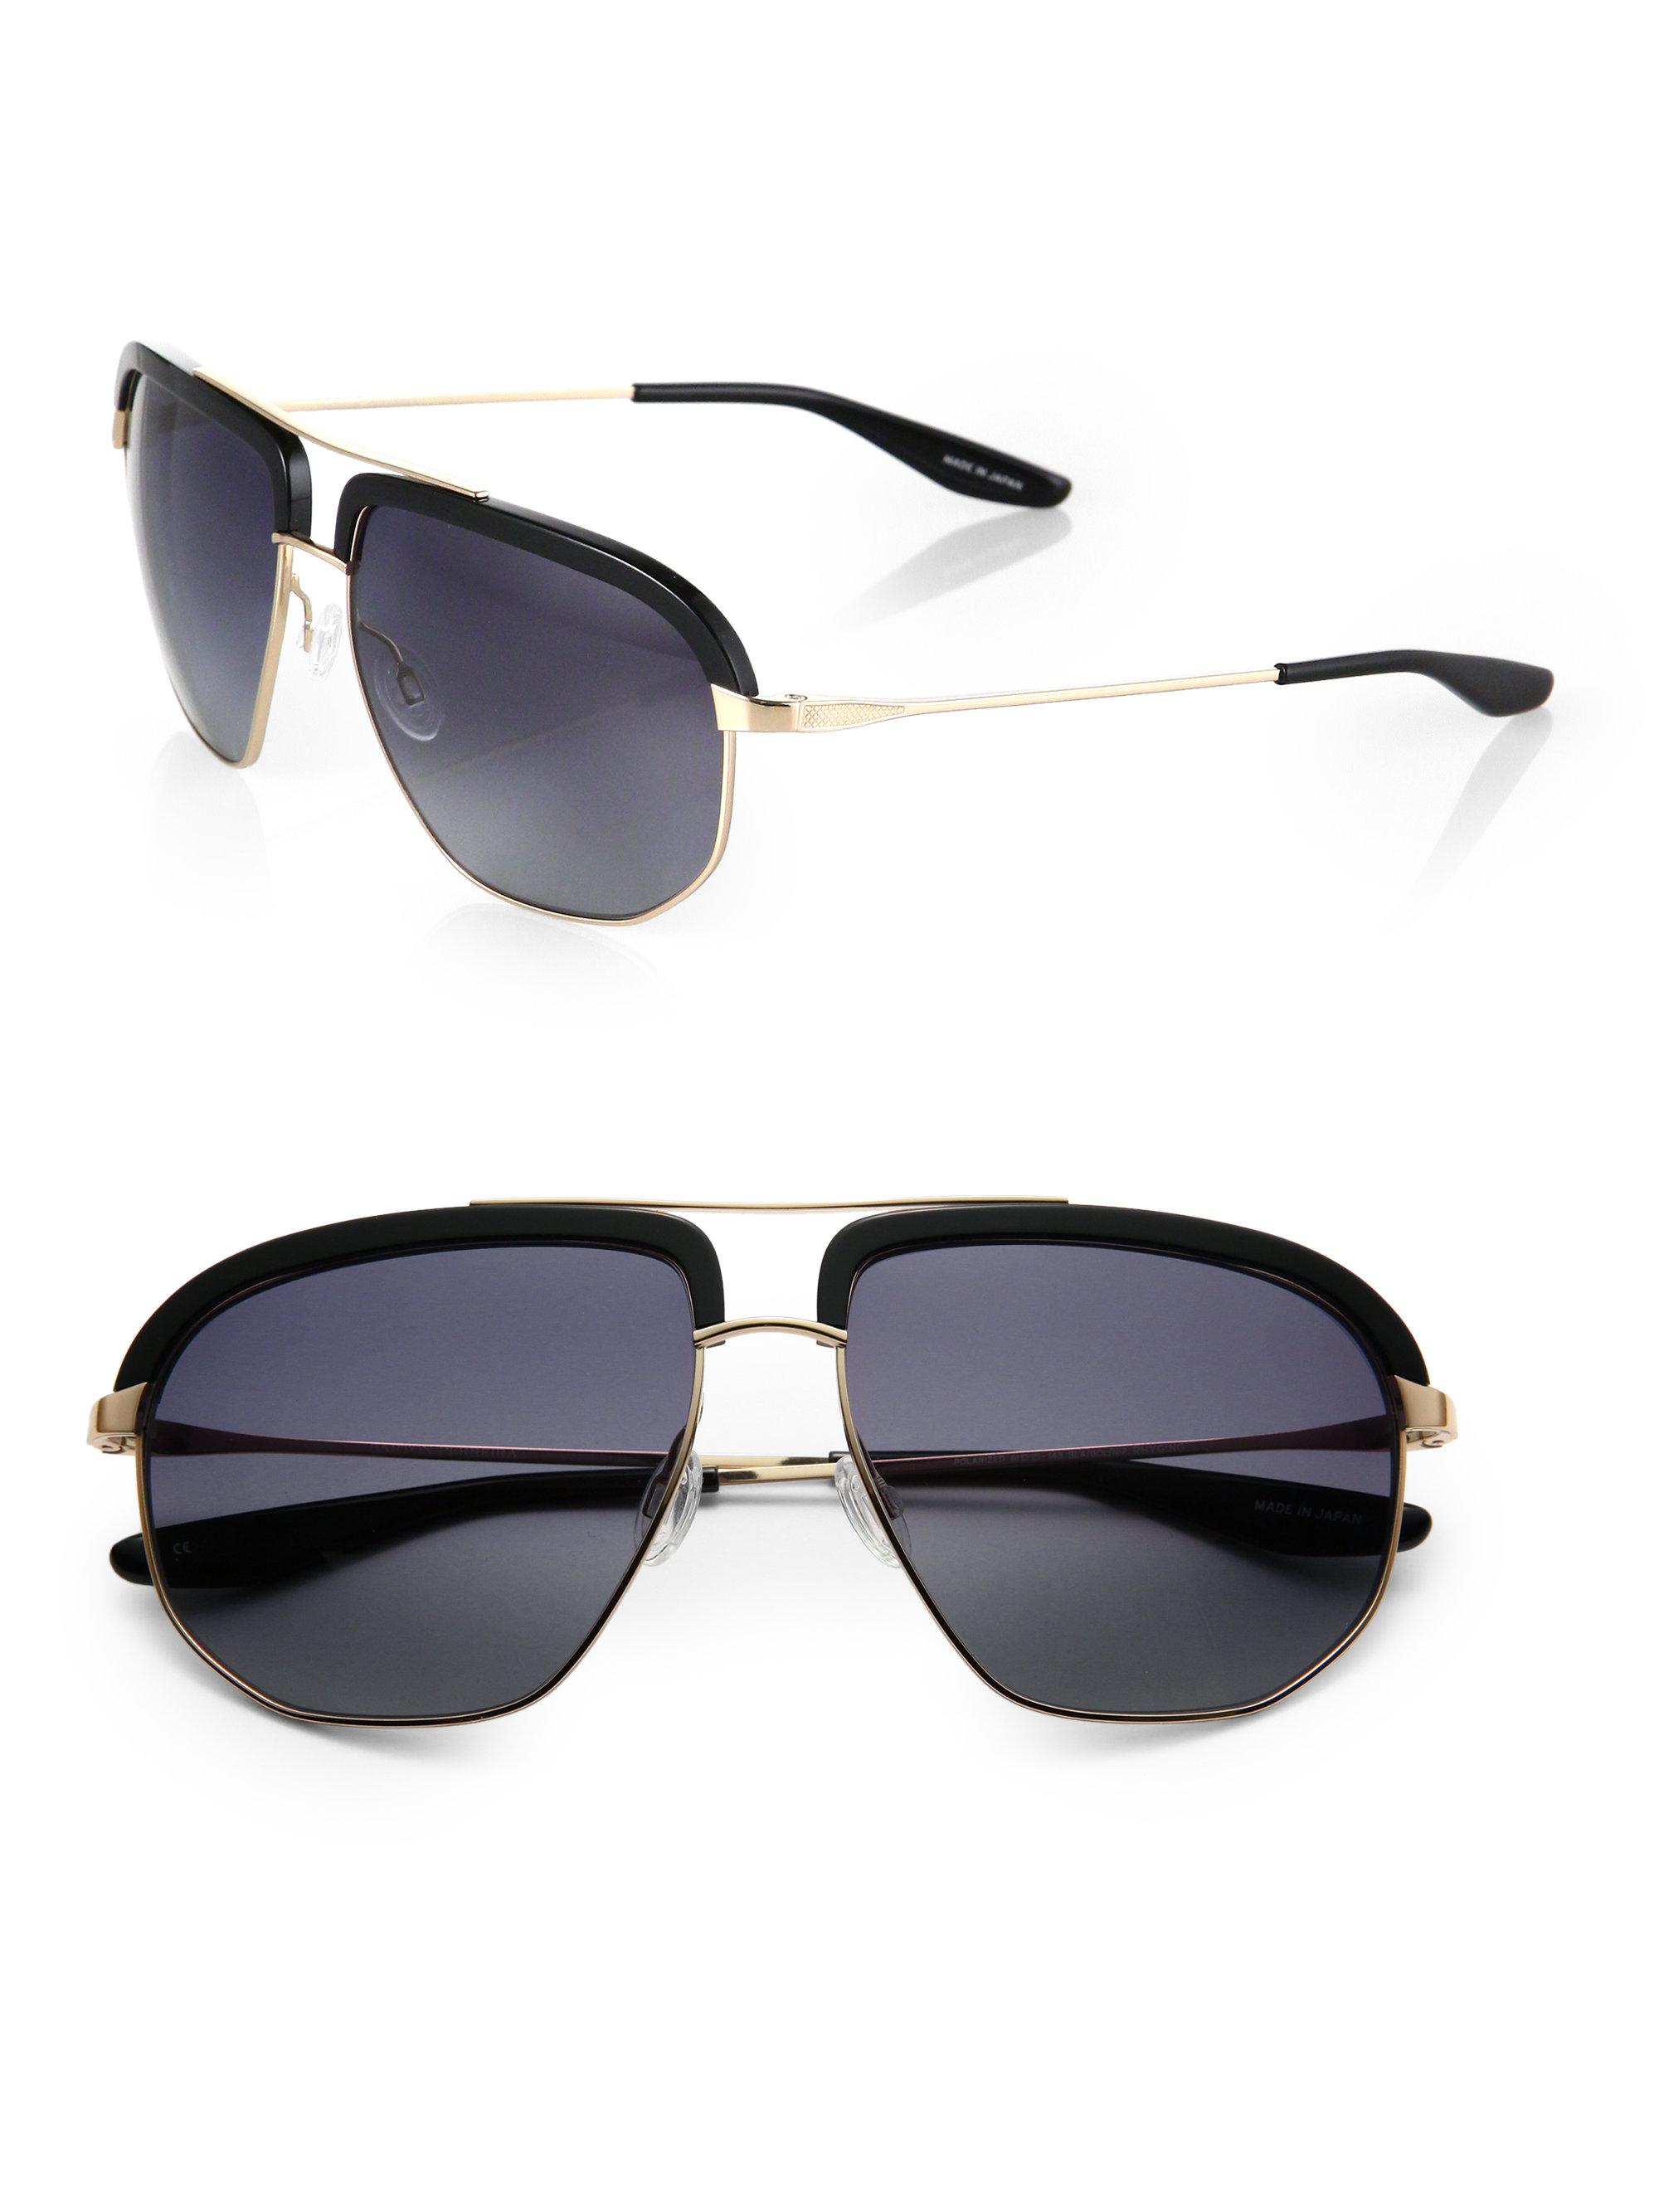 Maui Jim Warranty >> Barton Perreira Rhyging Metal & Acetate Sunglasses in ...